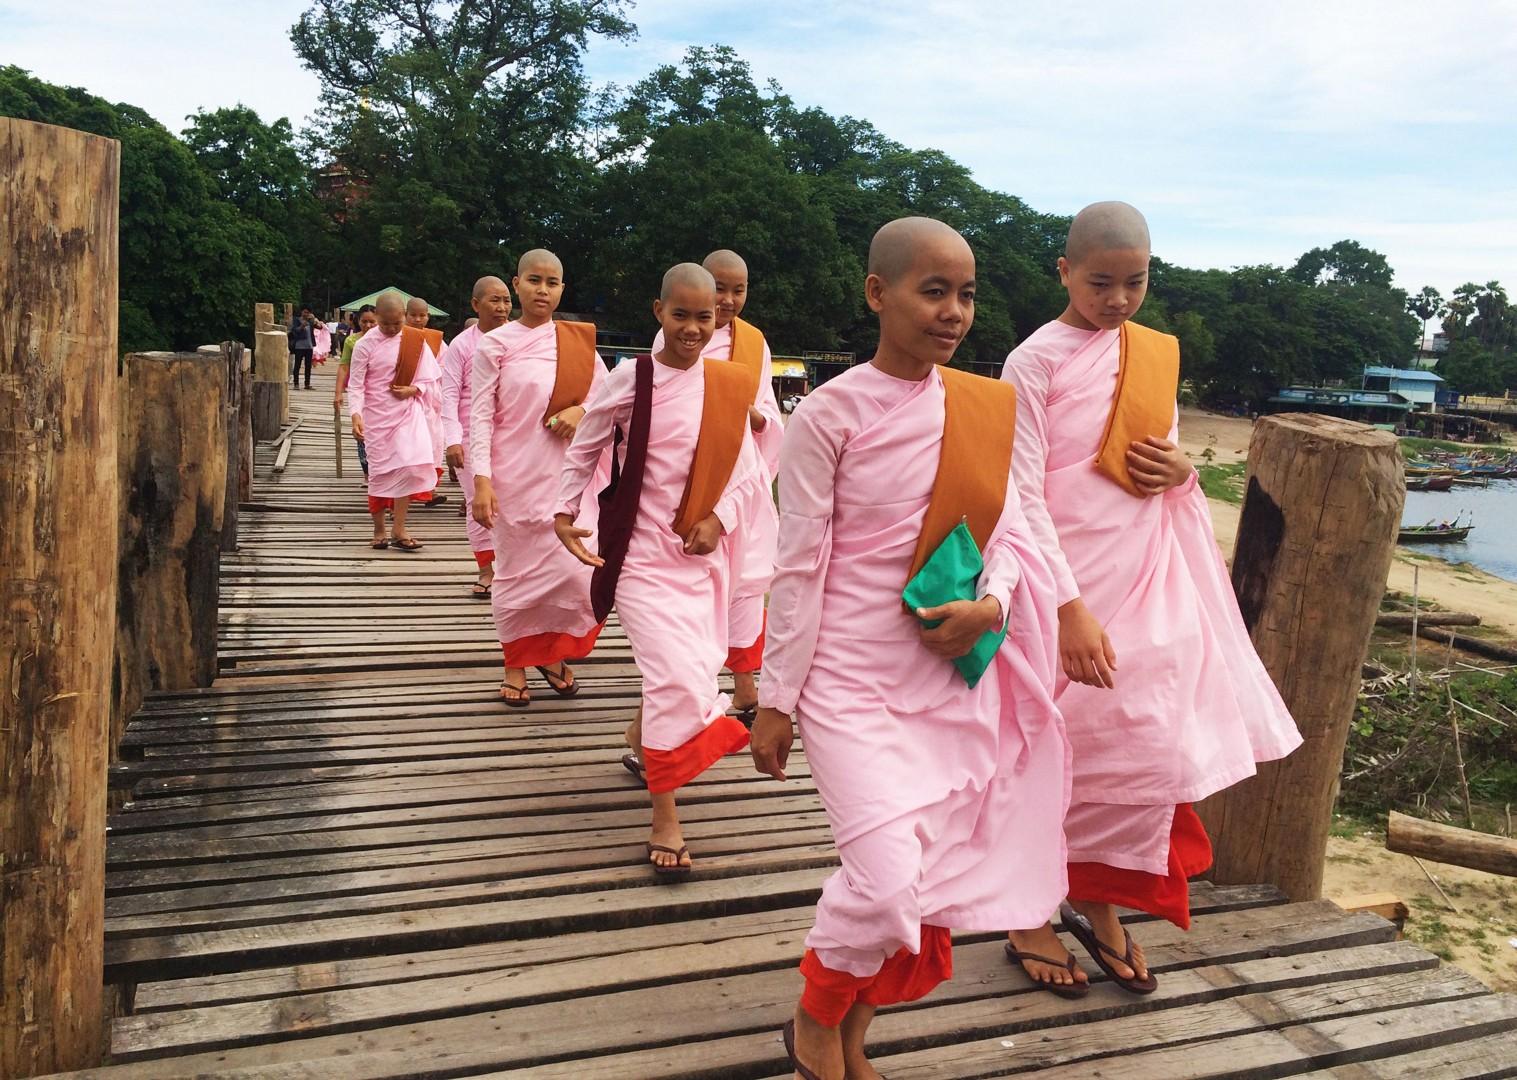 meet-locals-burma-group-cycling-holiday.jpg - Myanmar (Burma) - Bagan and Beyond - Cycling Adventures